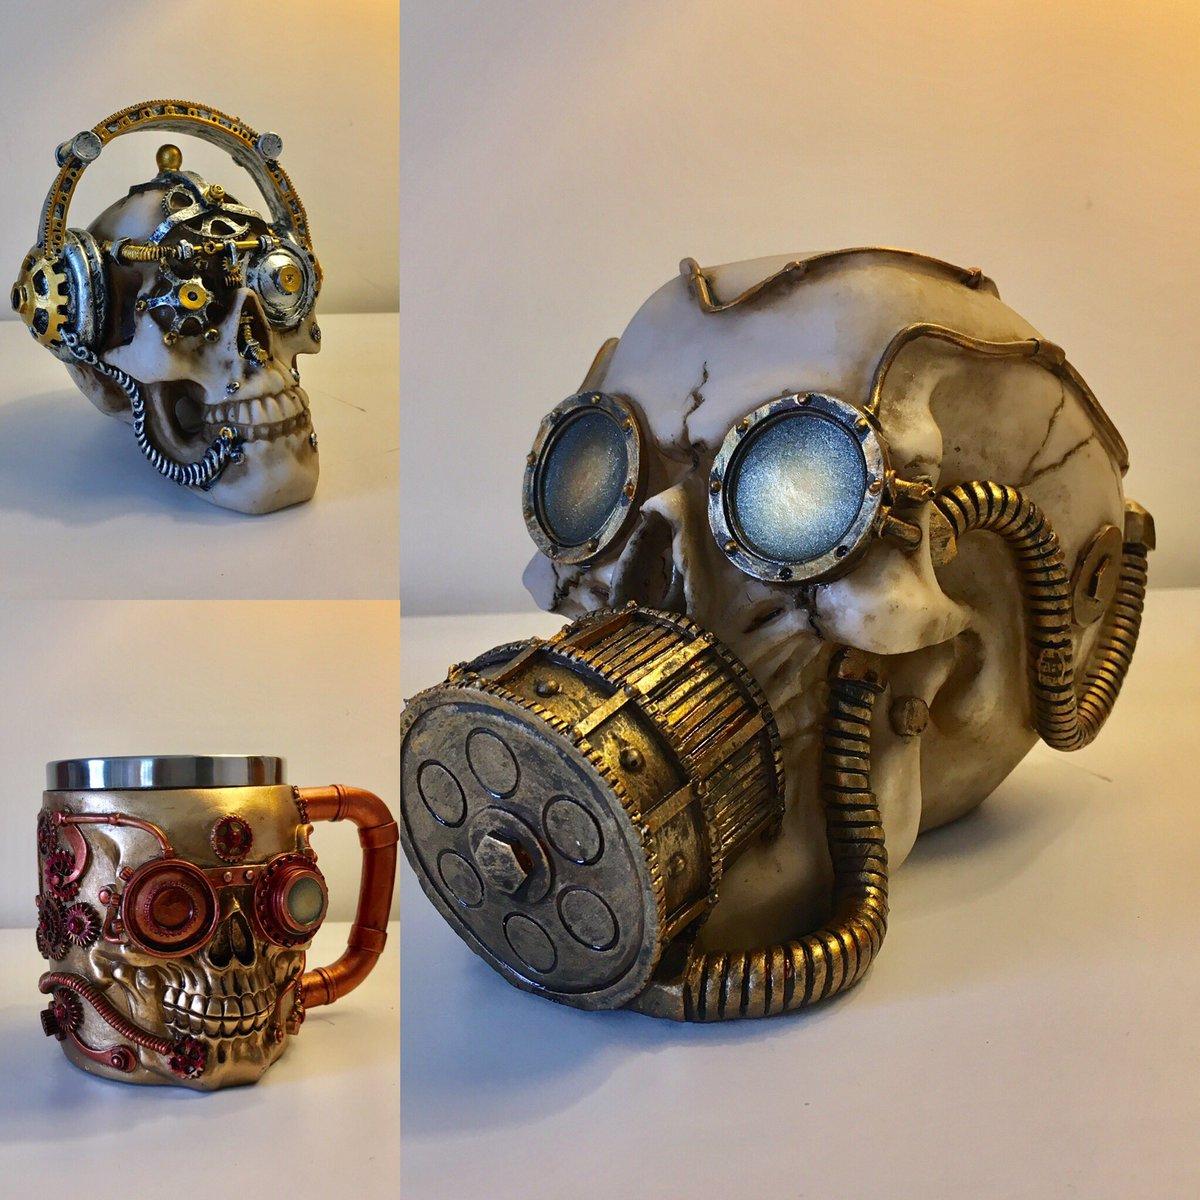 Three more great items @NRMShildon this weekend #Steampunk #design #style #durham #skull #tankard #mrchipsemporium #nacollectables